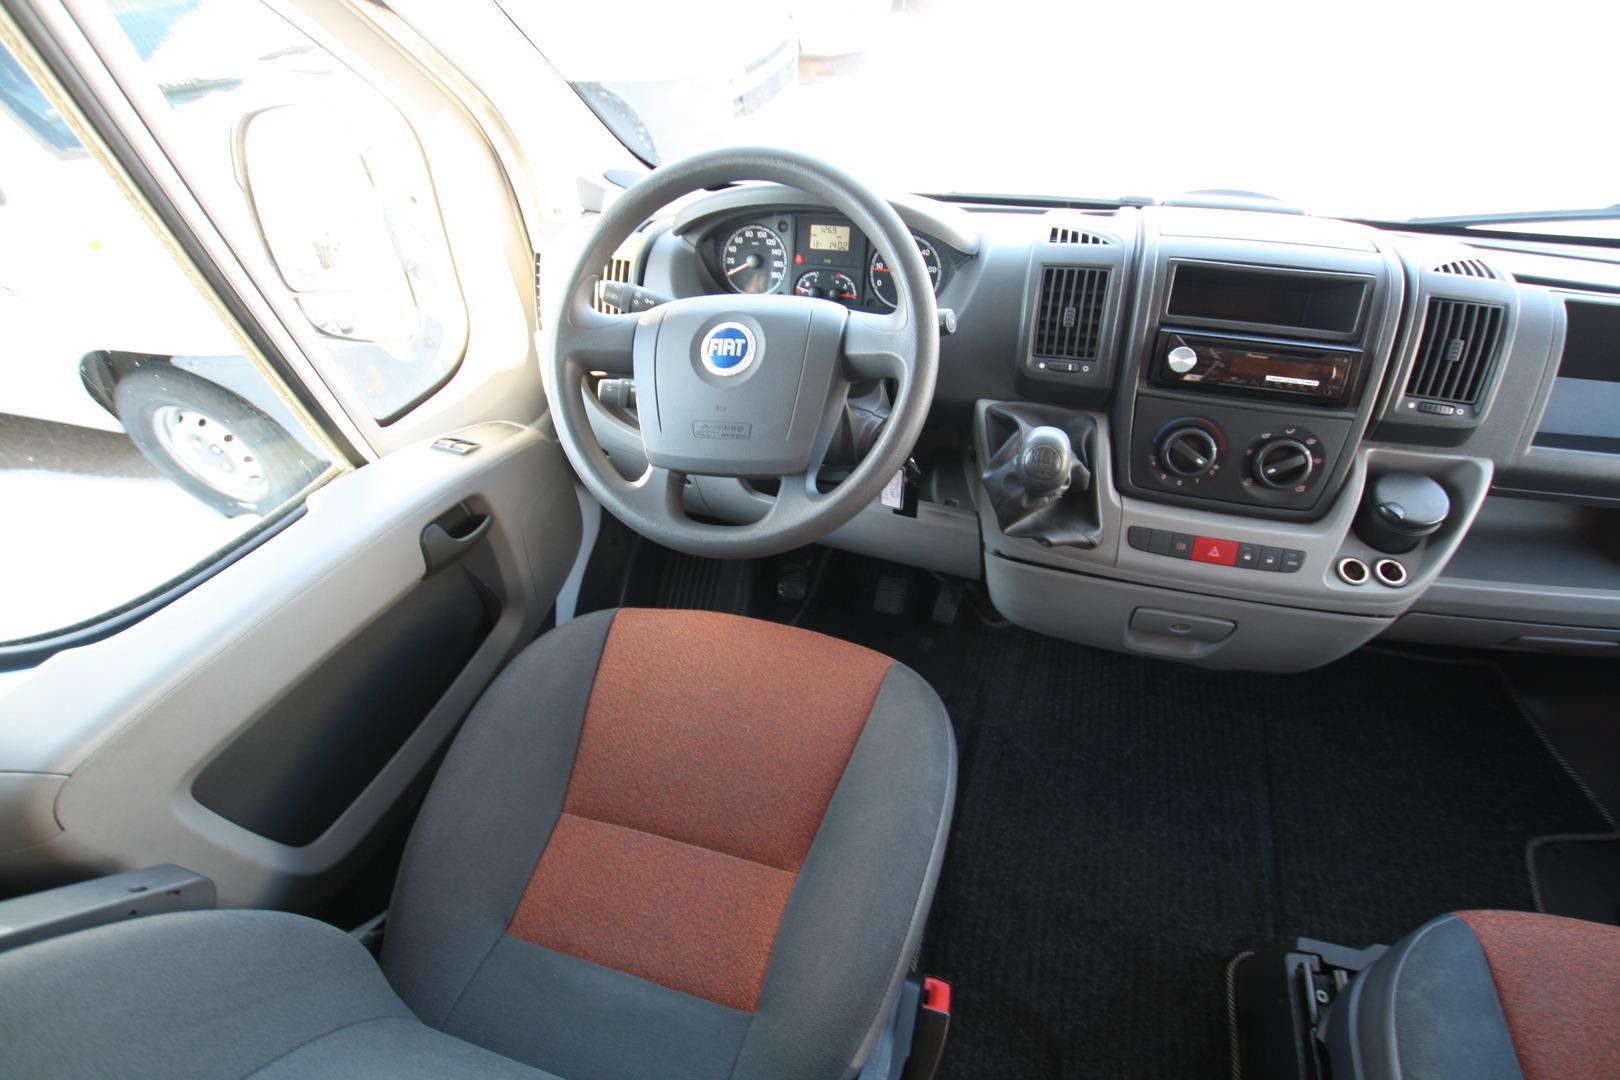 Fiat-Dethleffs 5881 A